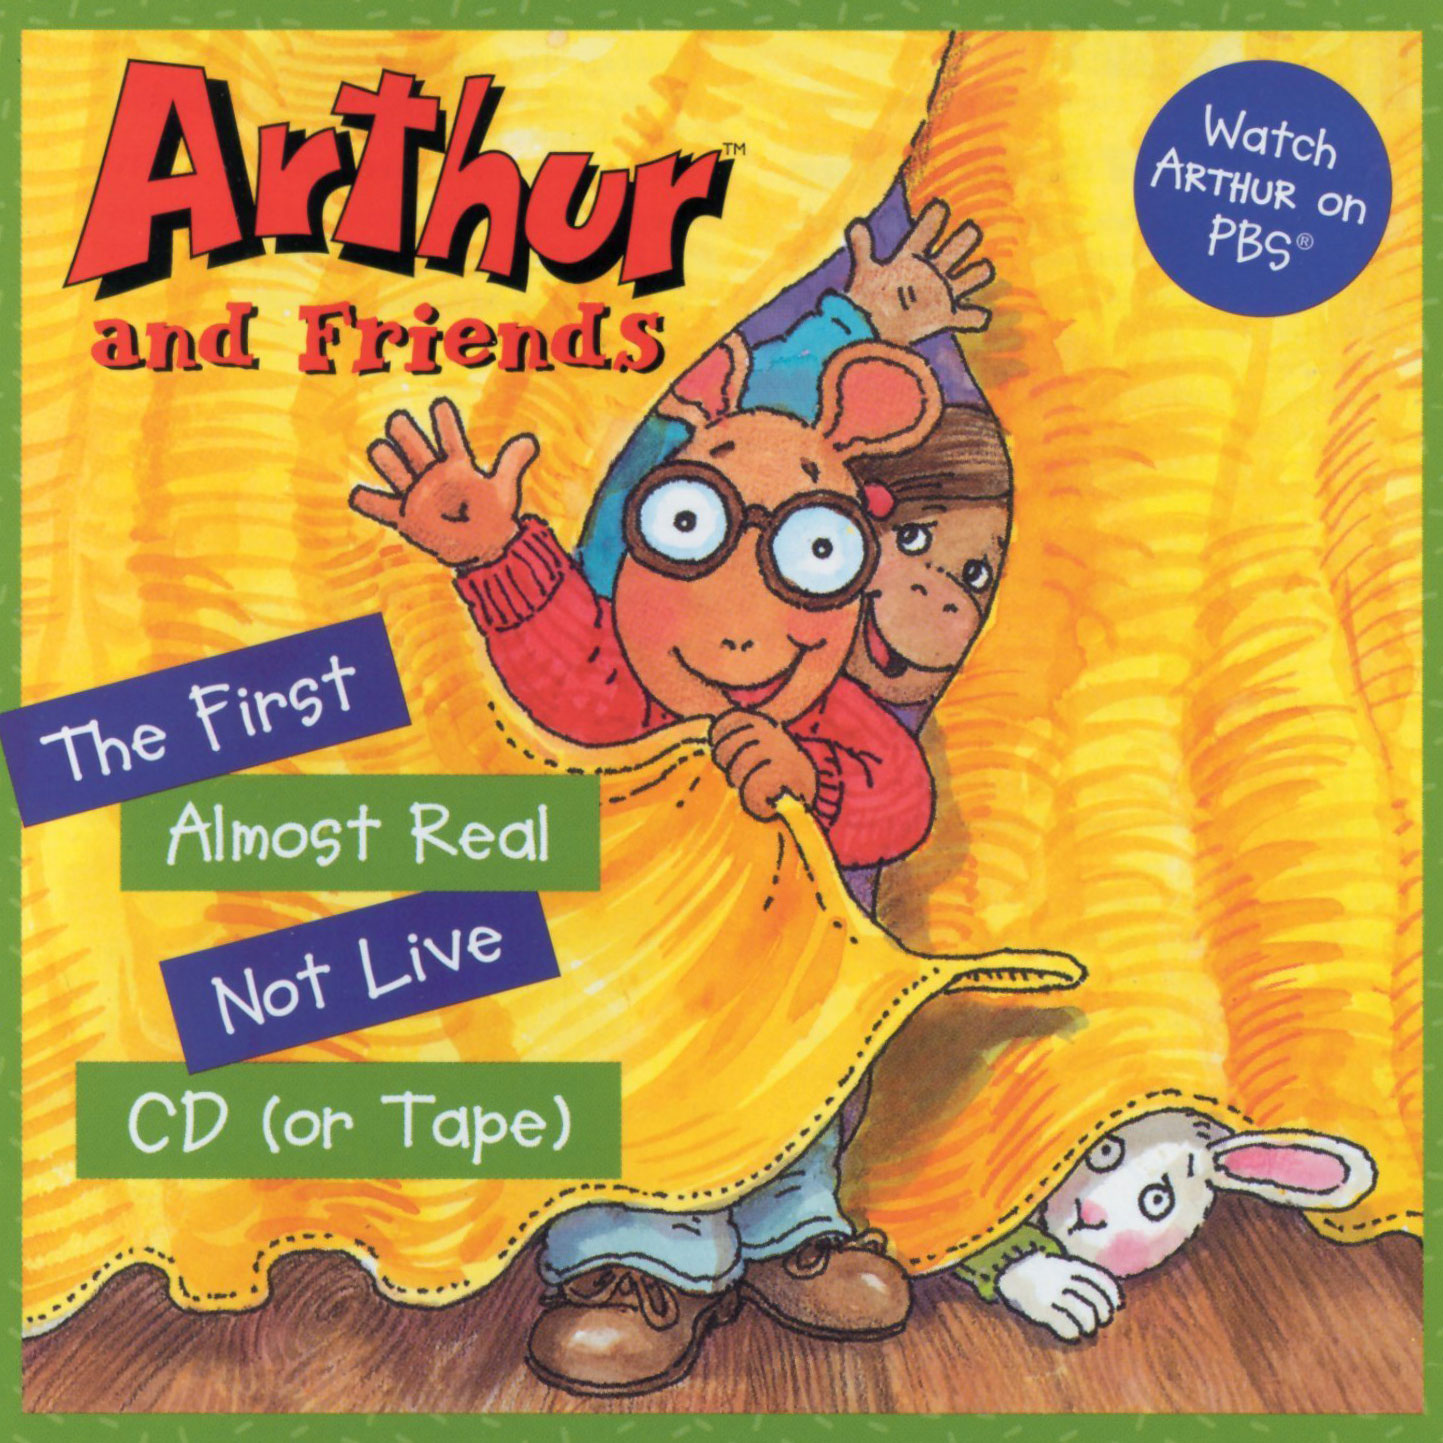 Five Best Live CDs